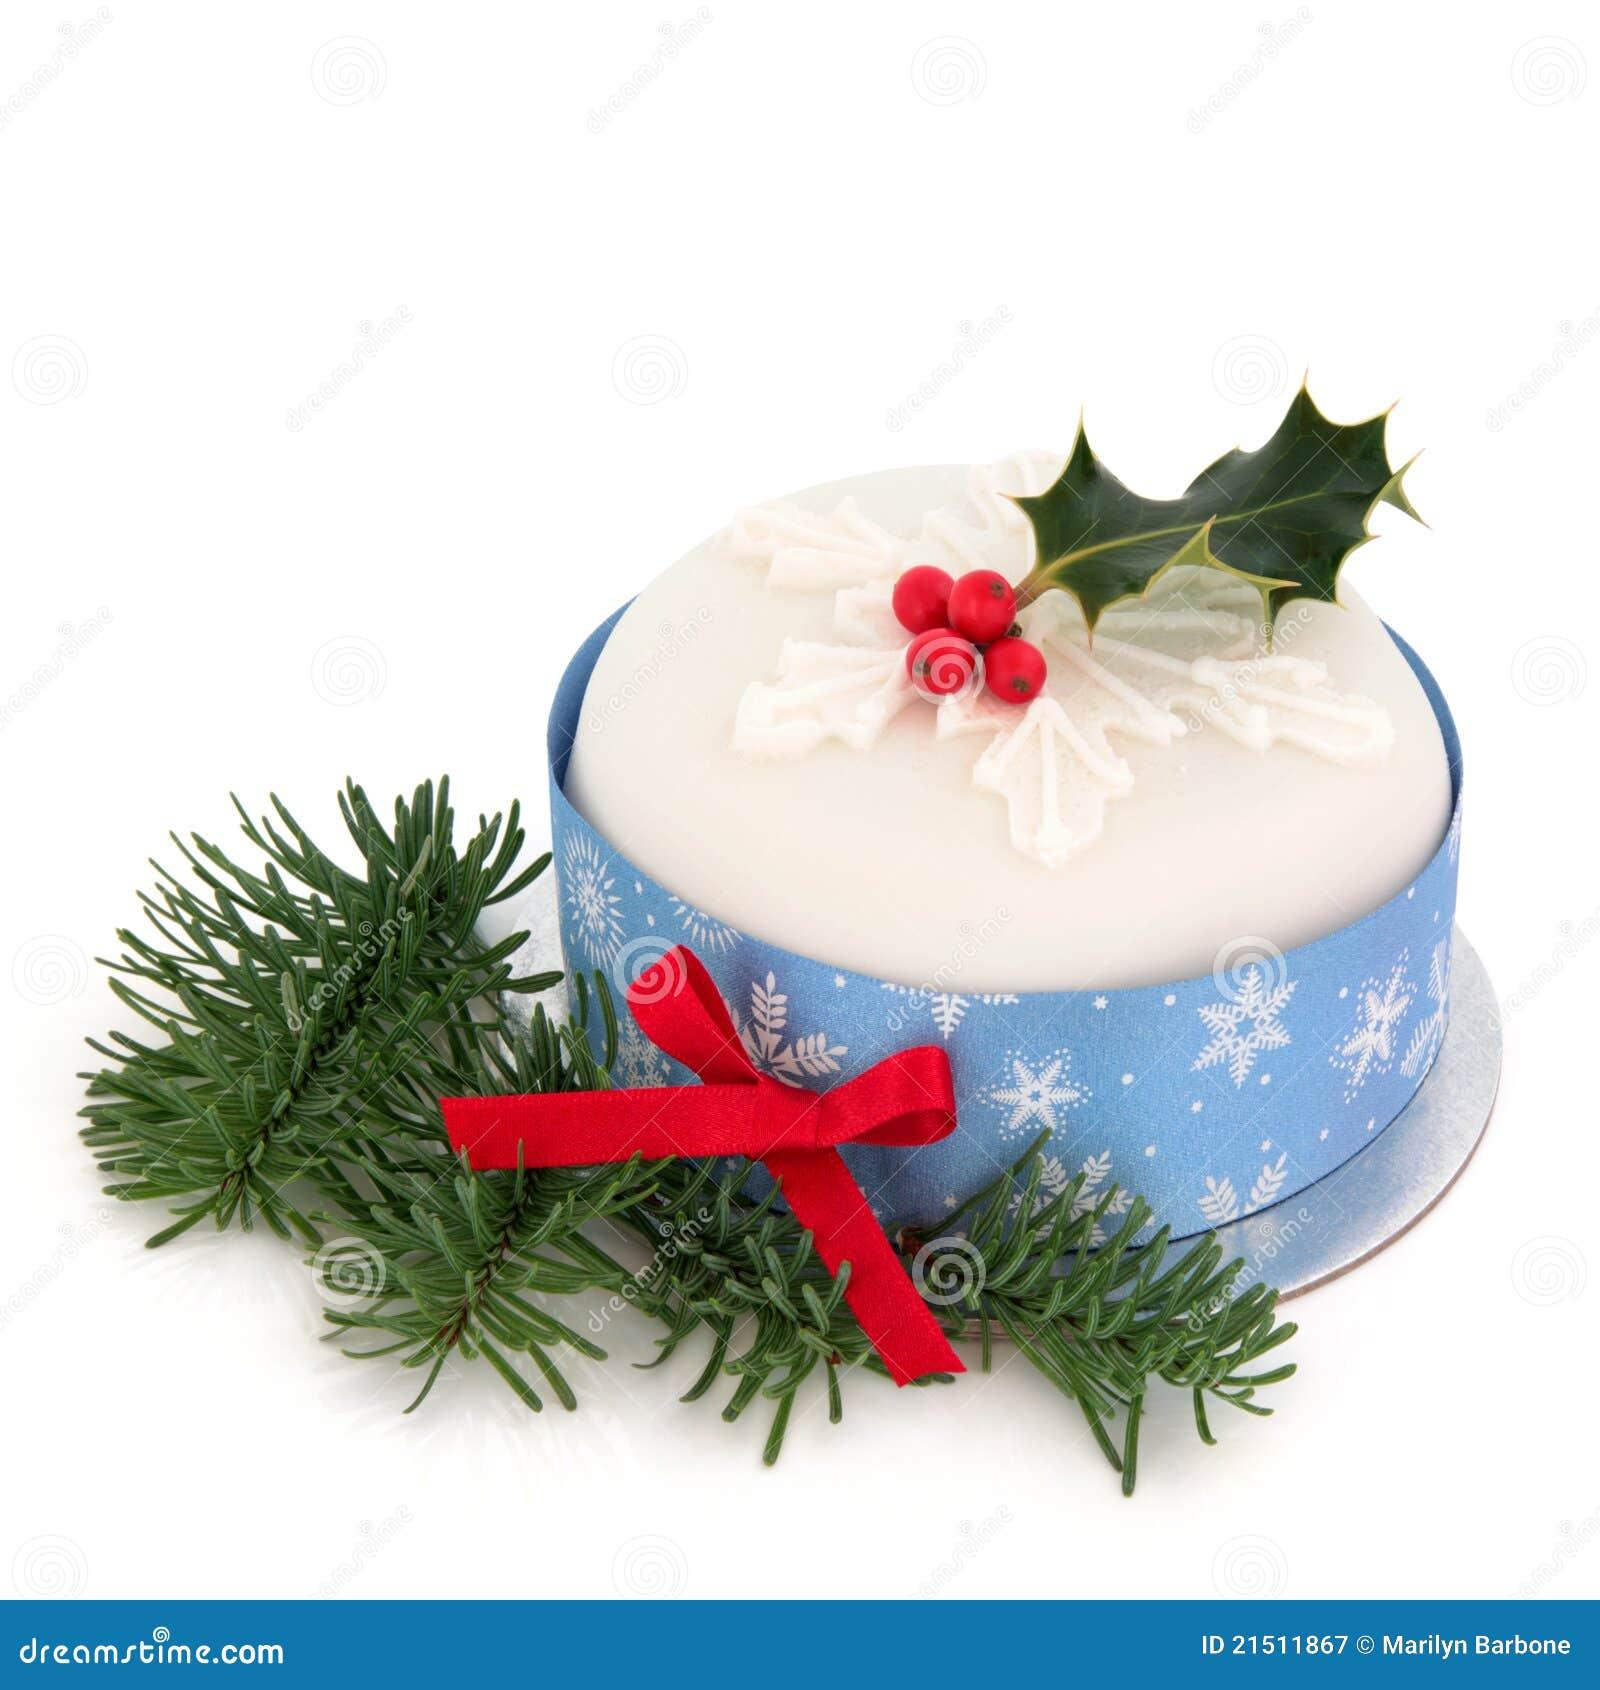 Free Clipart Christmas Cake : Christmas Cake stock image. Image of christmas, winter ...